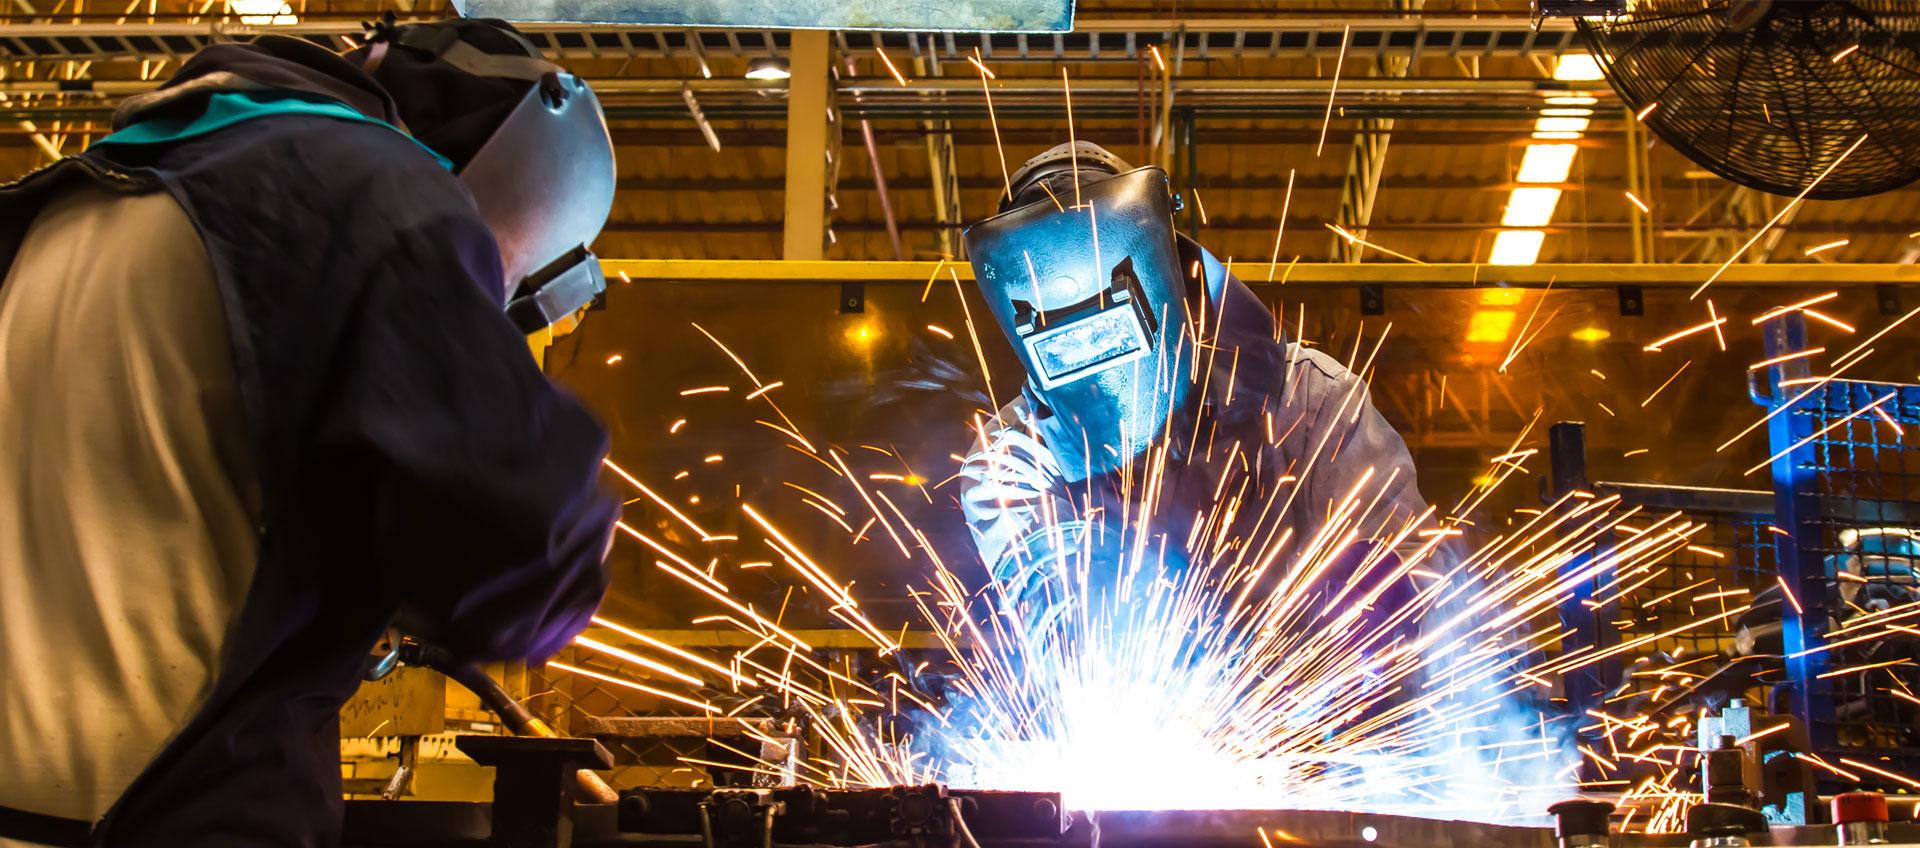 Photo of factory workers welding